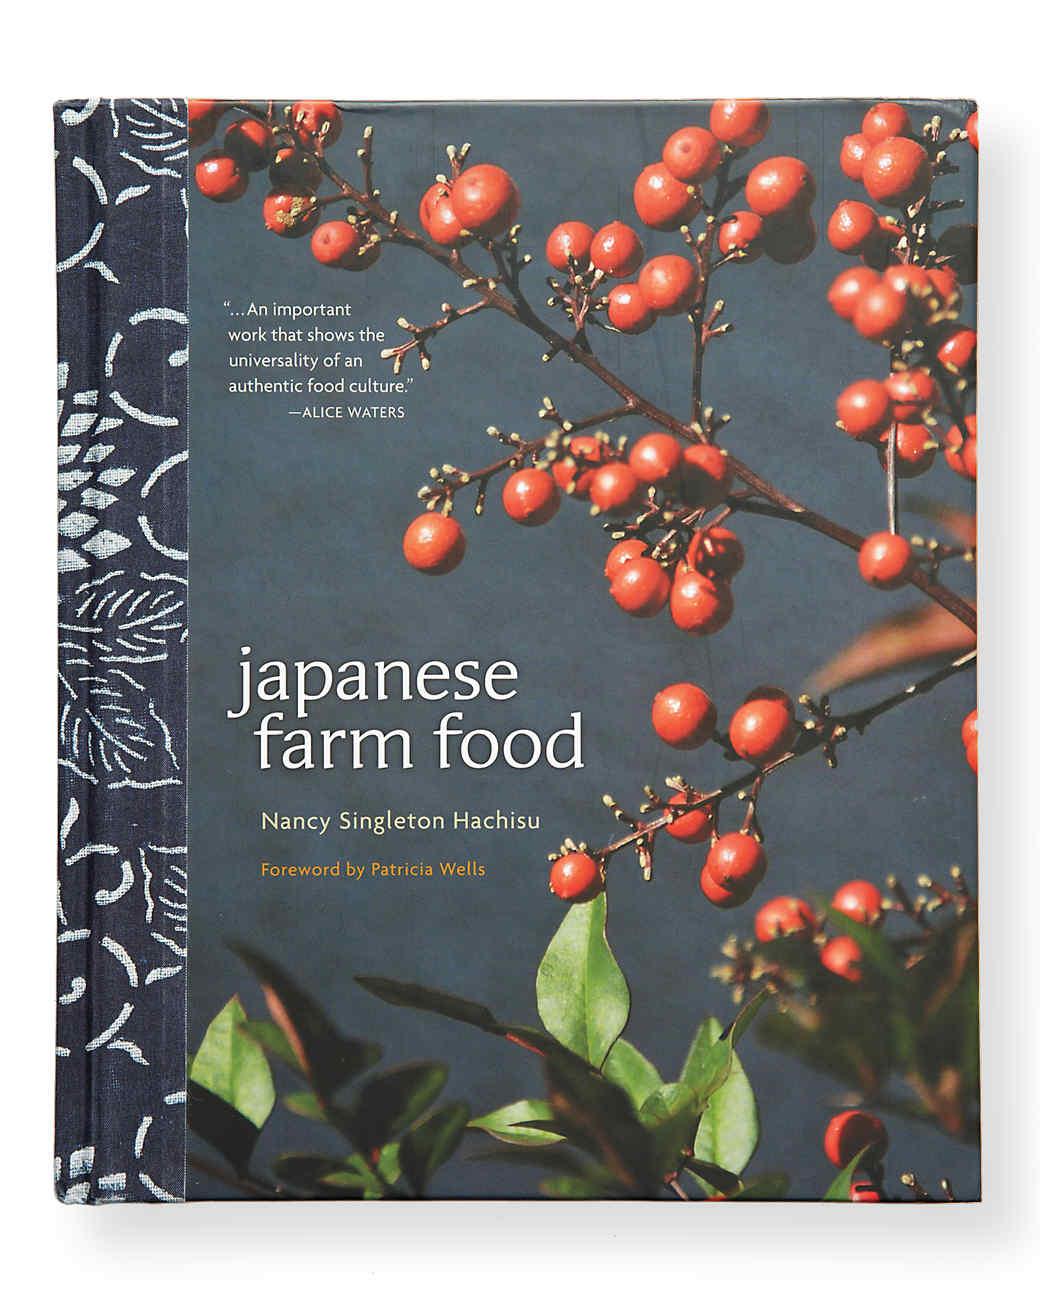 japanese-farm-food-010-mld109433.jpg